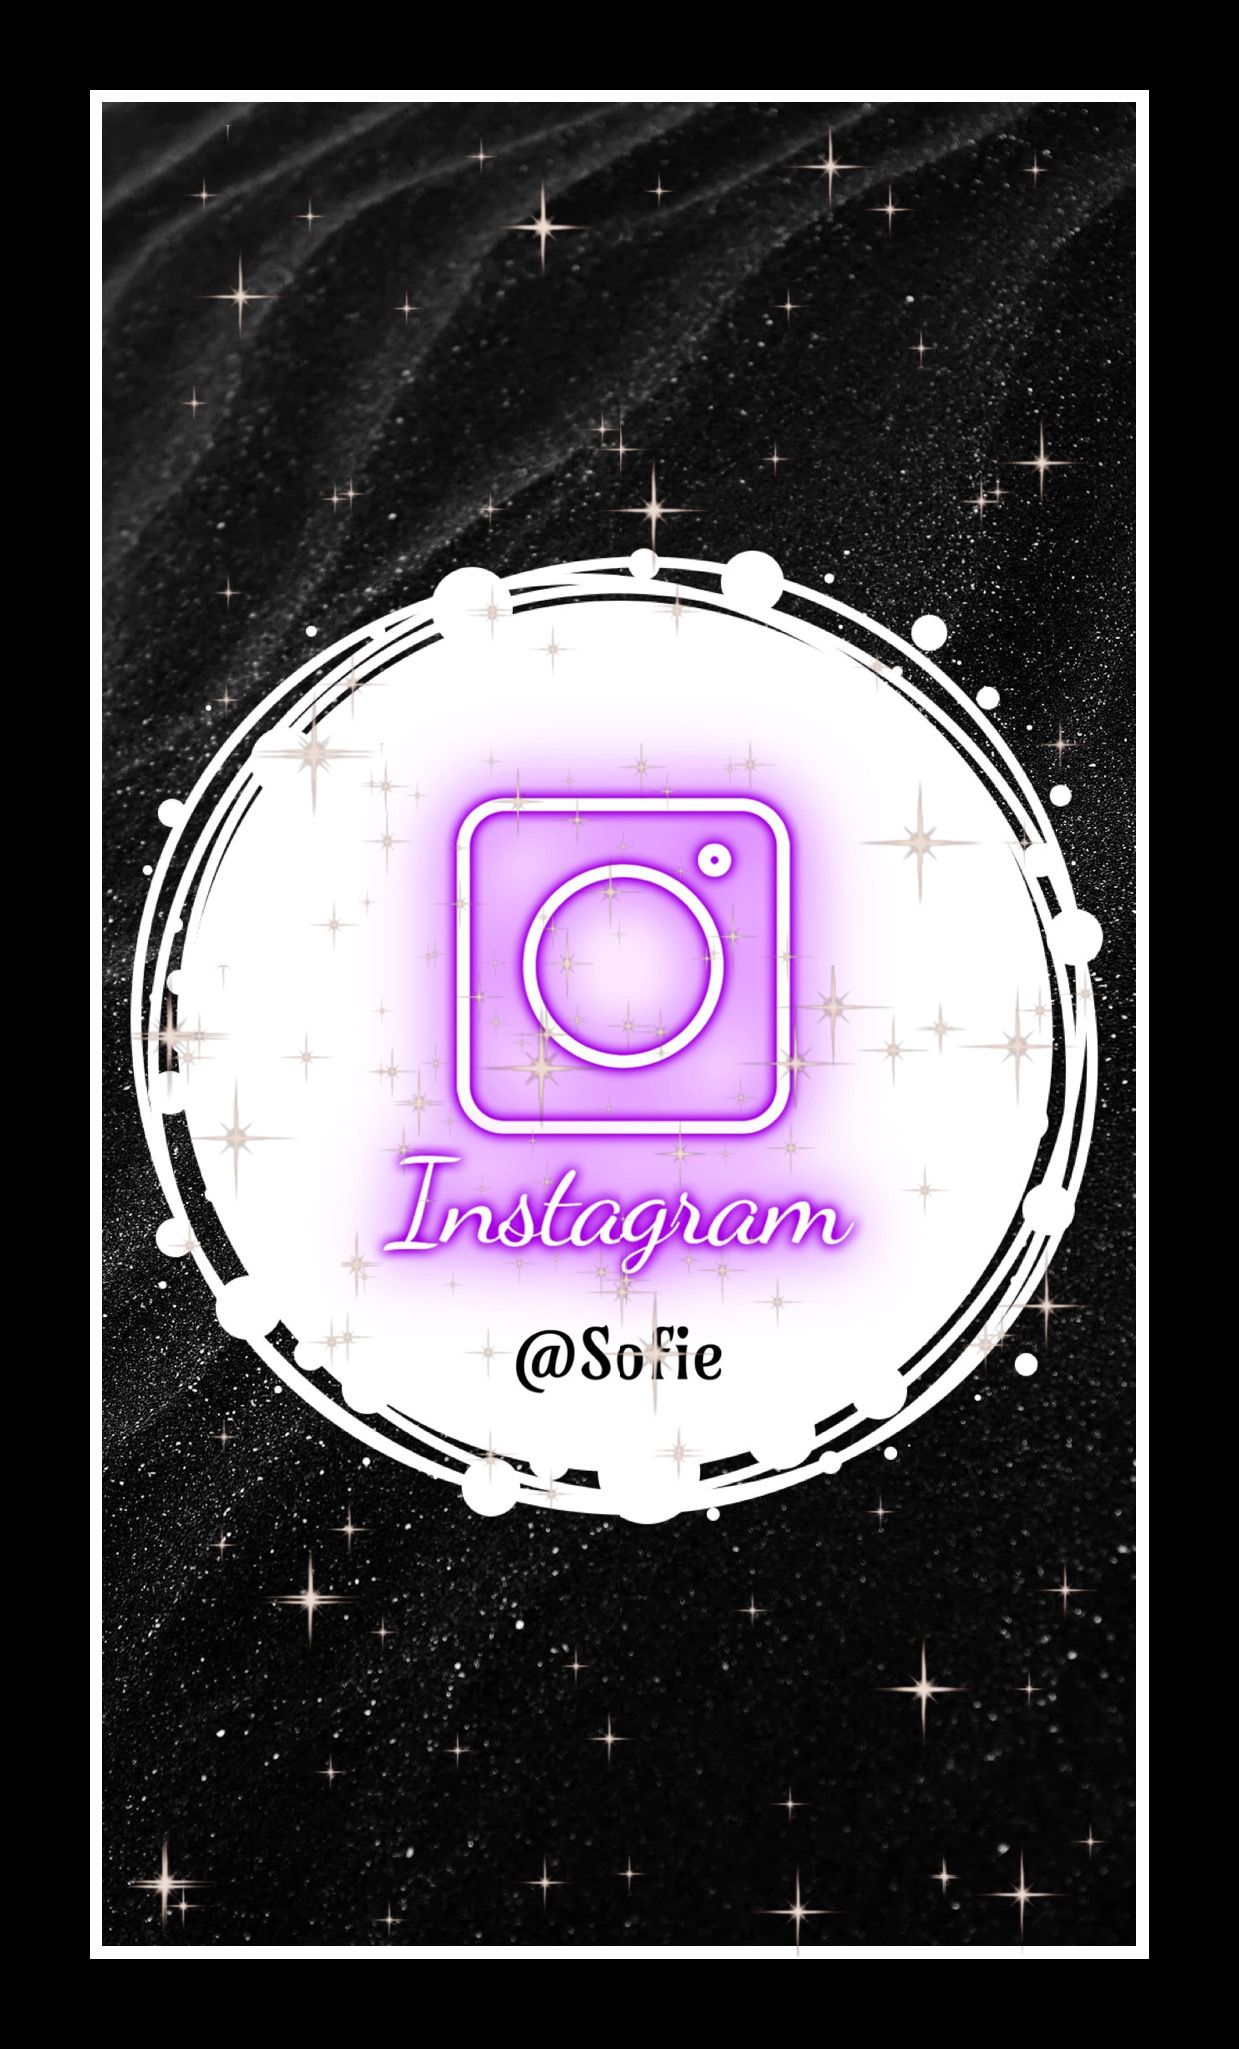 #freetoedit #picsart #storyart #logo #logos #photographyart #photographie #photoedits #instagram #label #labels #illustration #illustrations